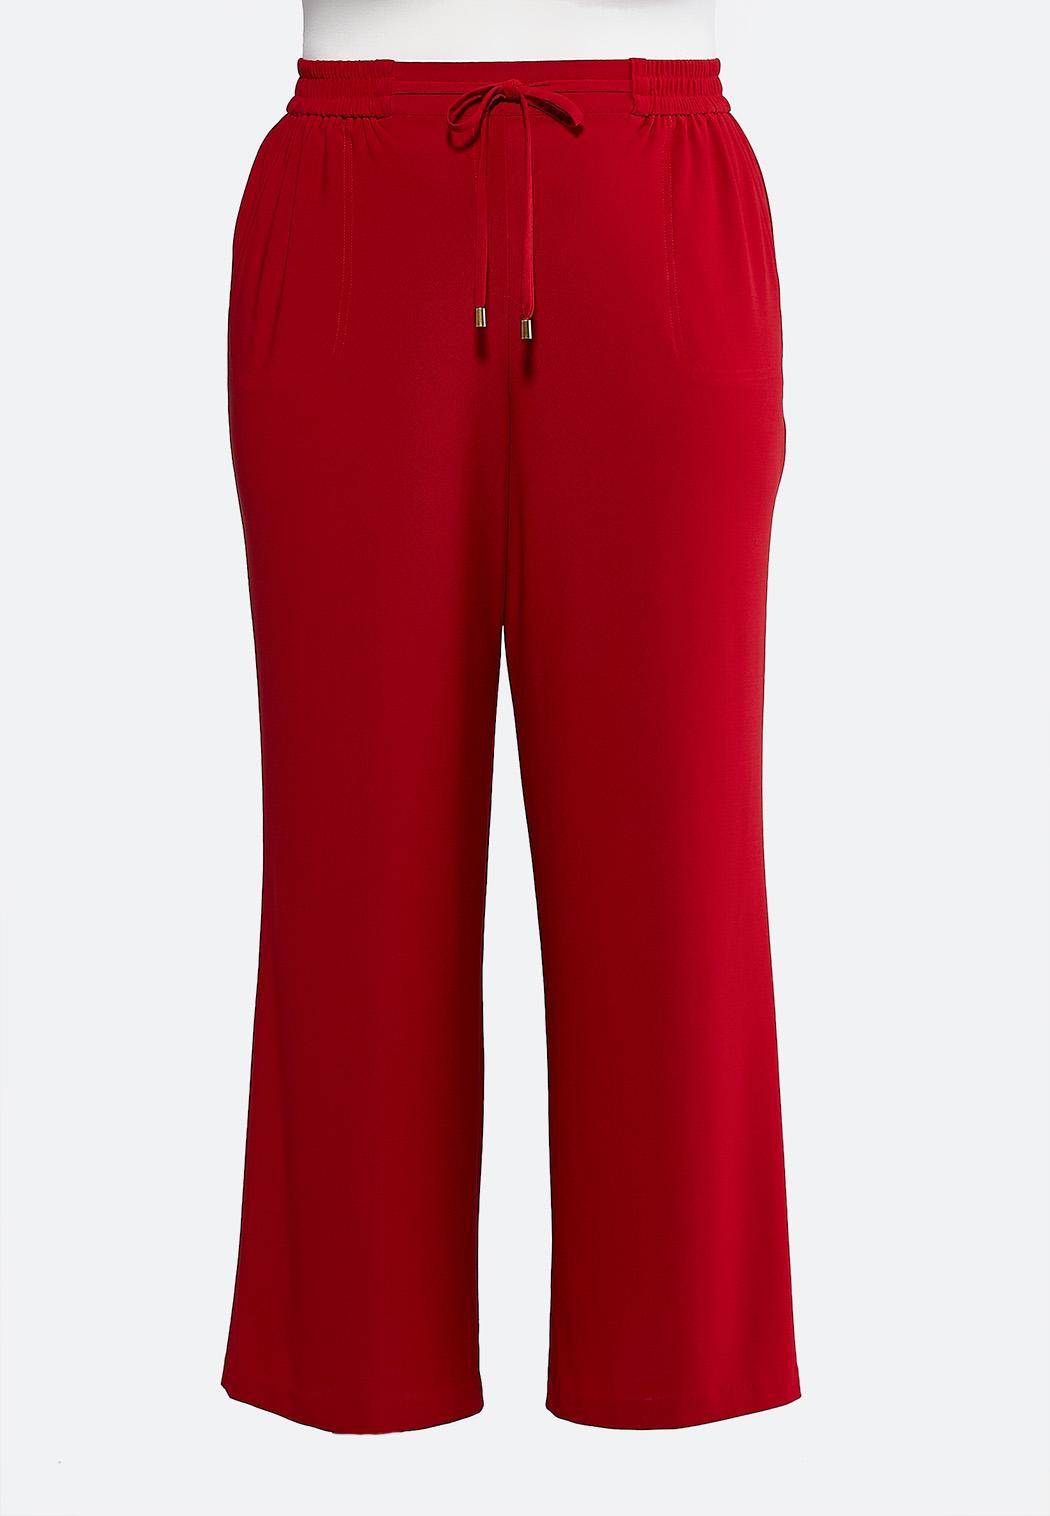 6baf65fb546 Women s Plus Size Pants